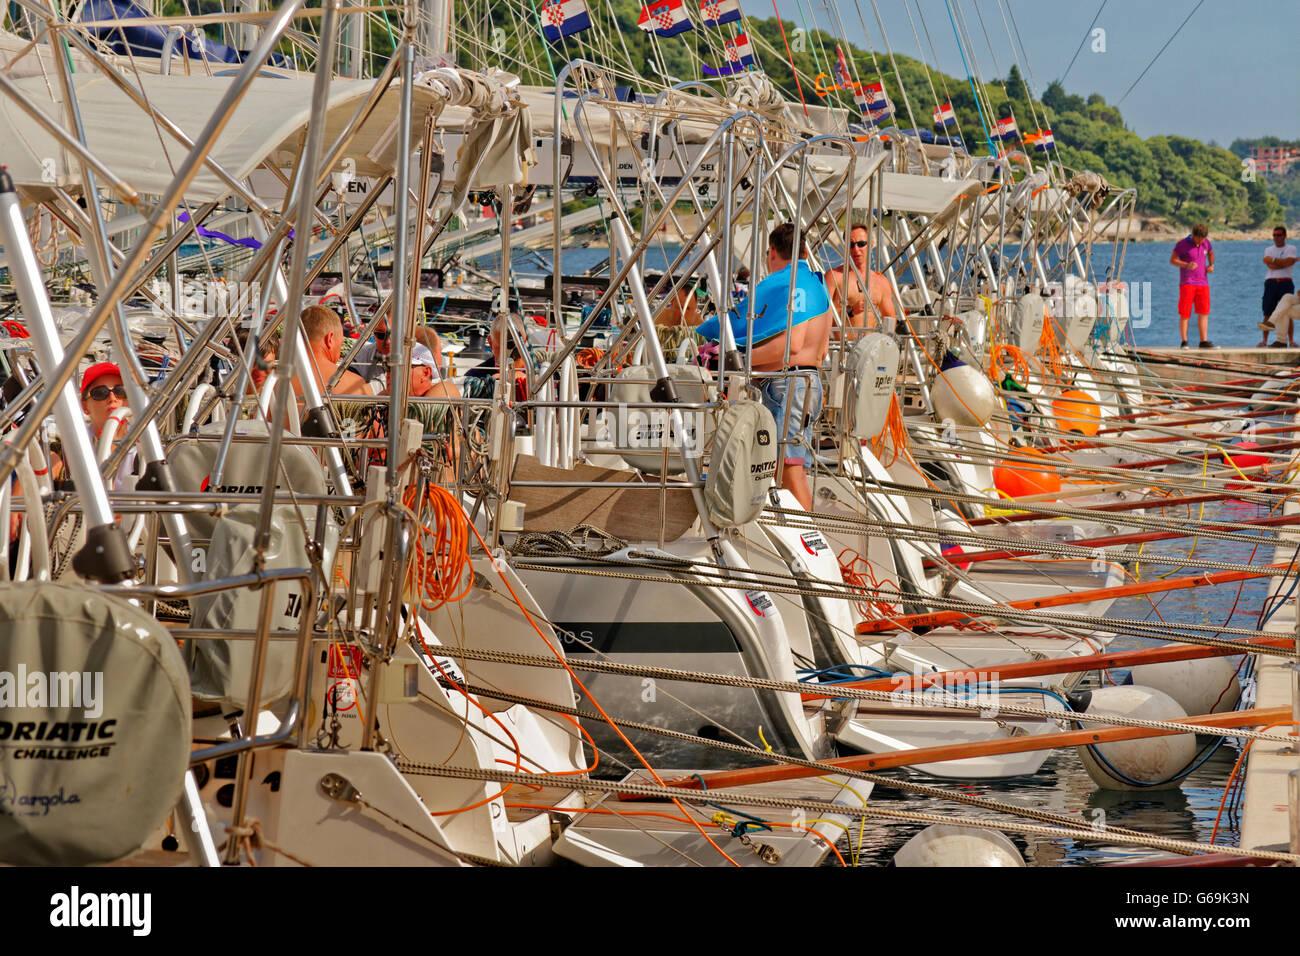 Croatian charter cruising yachts on marina pontoon on Adriatic coast of Croatia. - Stock Image